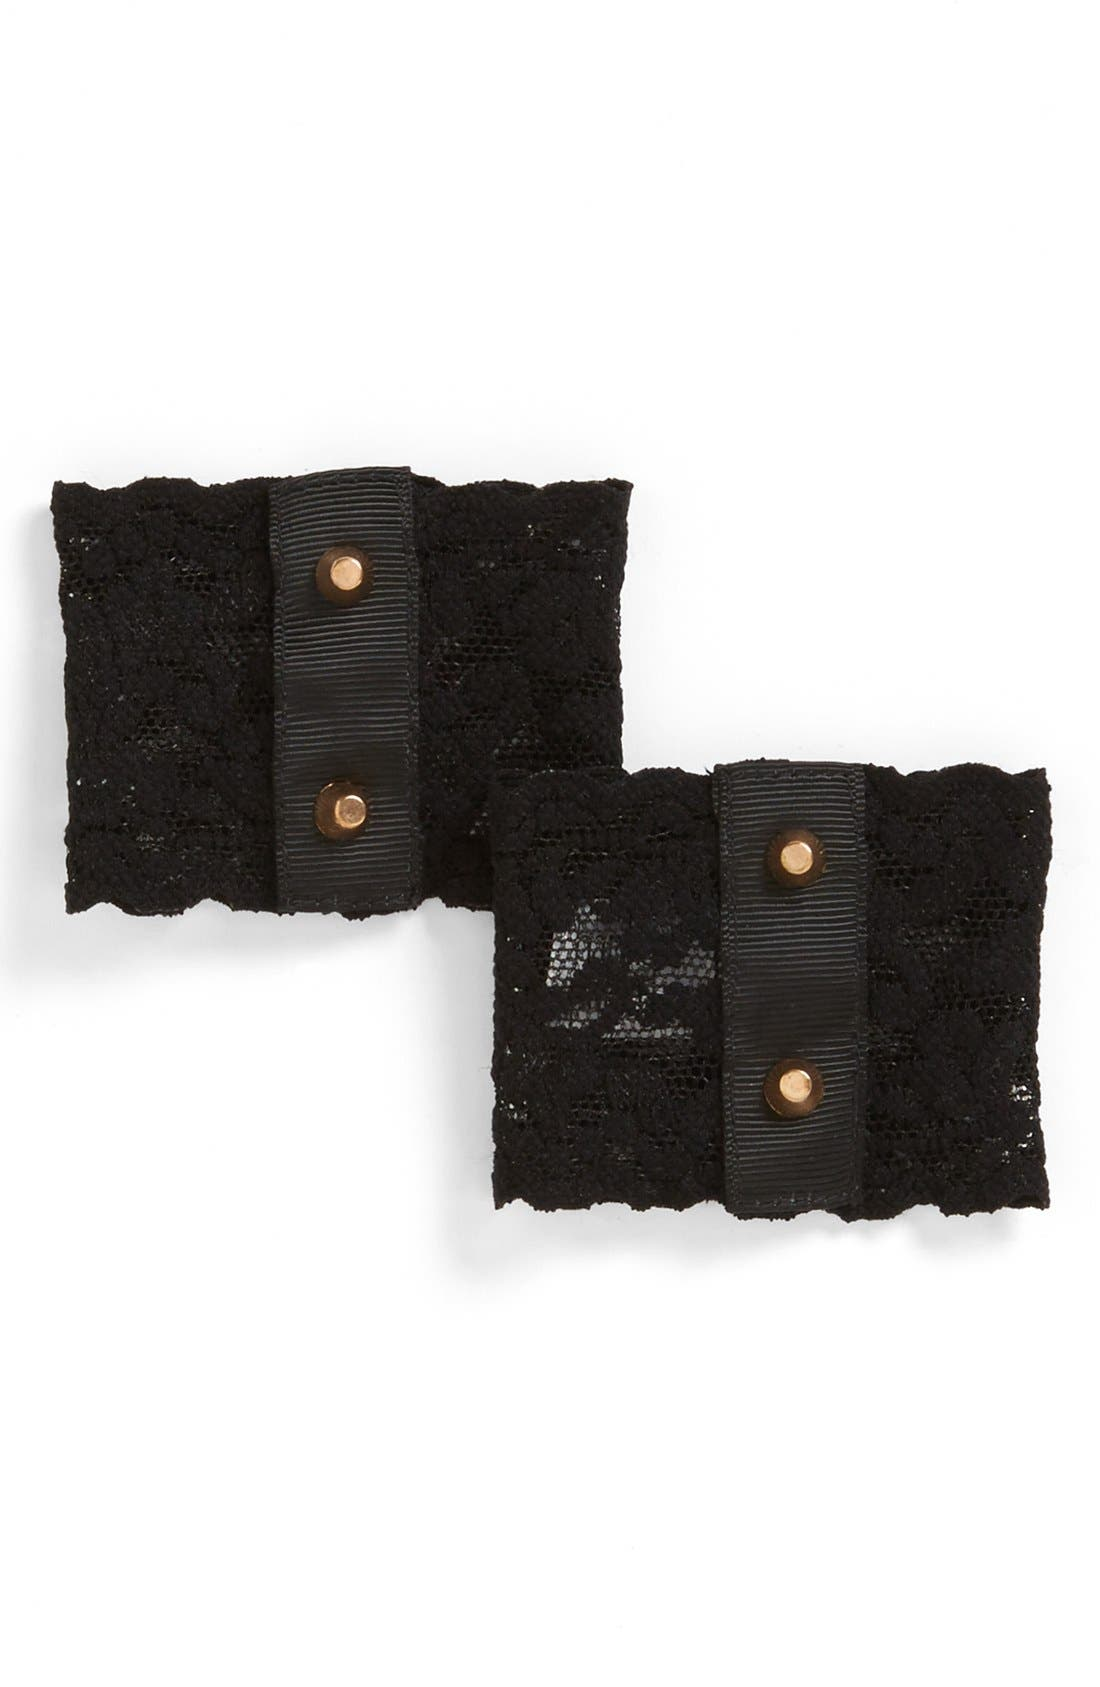 Alternate Image 3  - Hanky Panky 'After Midnight' Studded Cuffs